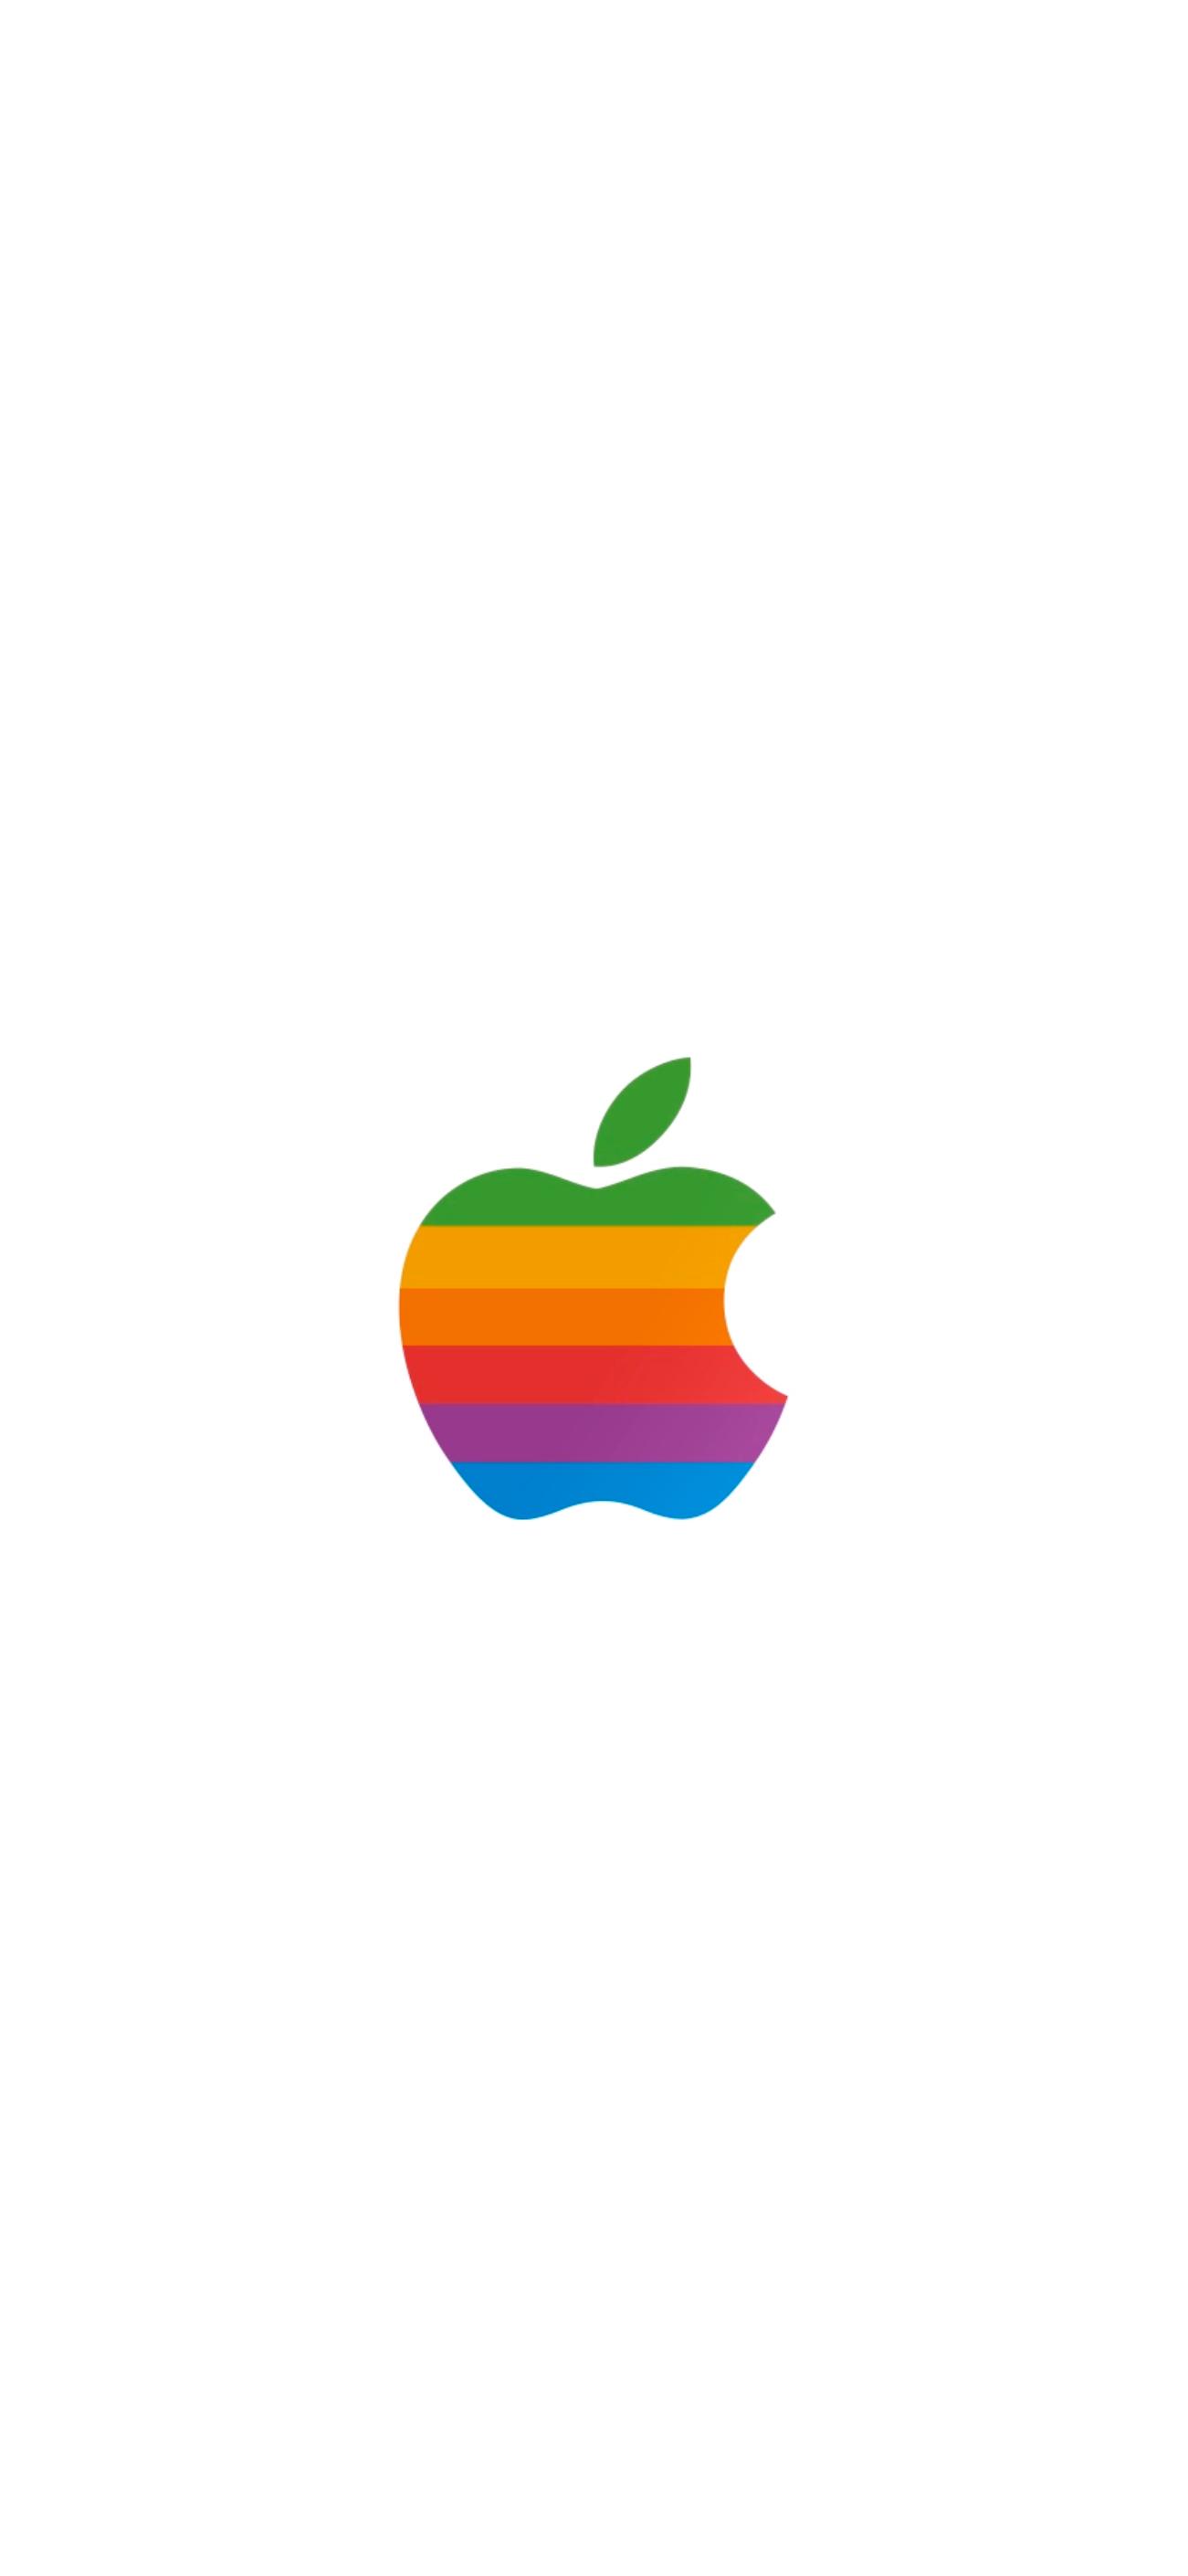 Download Iphone Xs Max Wallpaper Rainbow Cikimm Com Rainbow Wallpaper Iphone Apple Logo Wallpaper Iphone Apple Logo Wallpaper